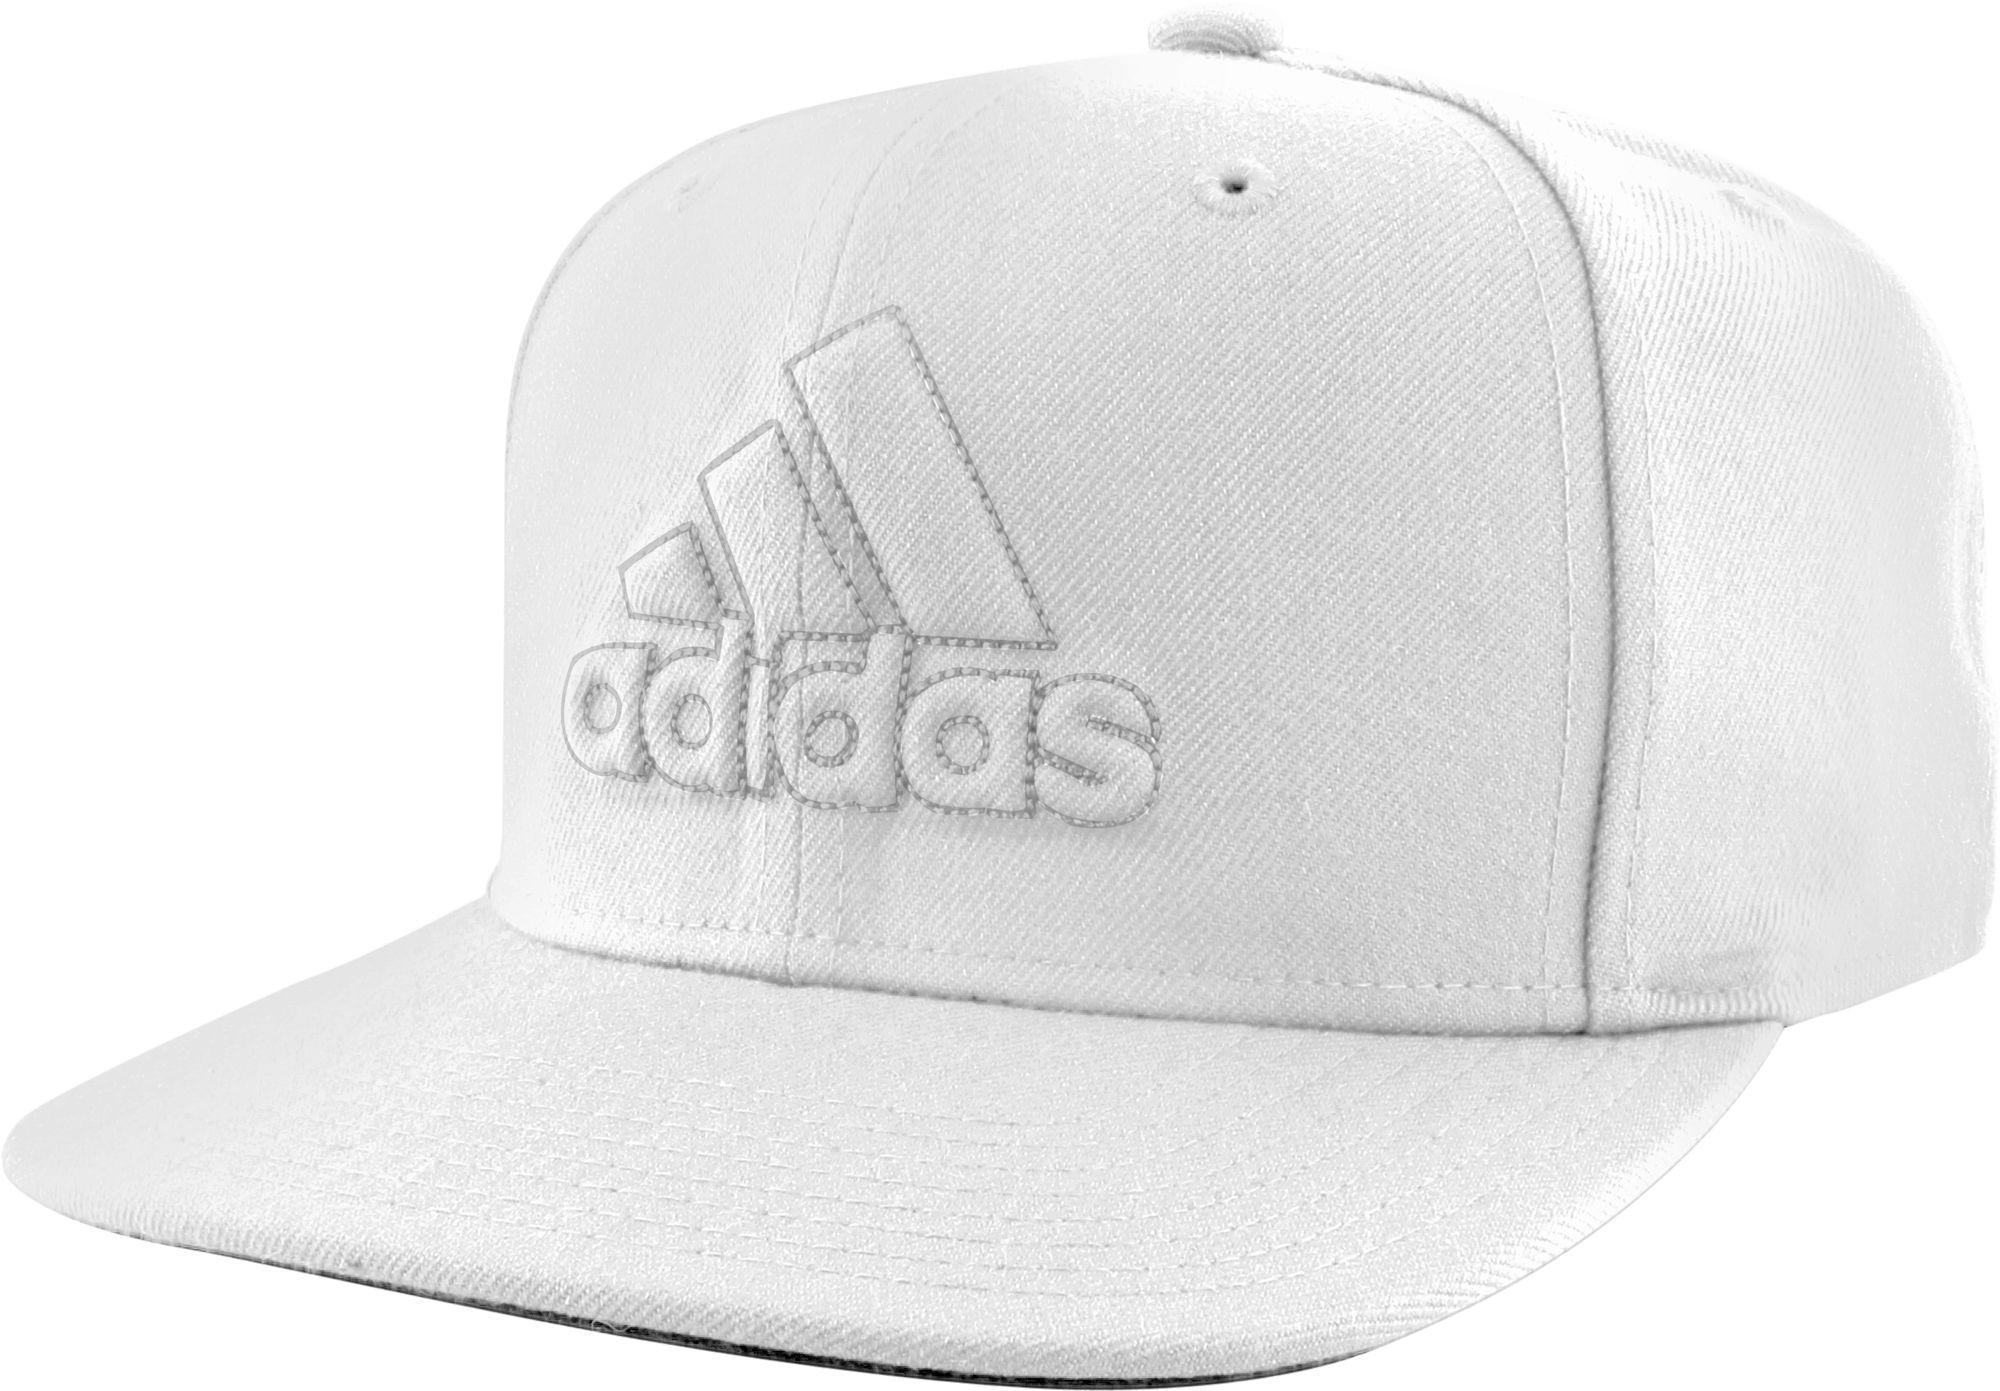 d4c57bd96c6 Lyst - adidas Originals Daybreaker Snapback Hat in White for Men